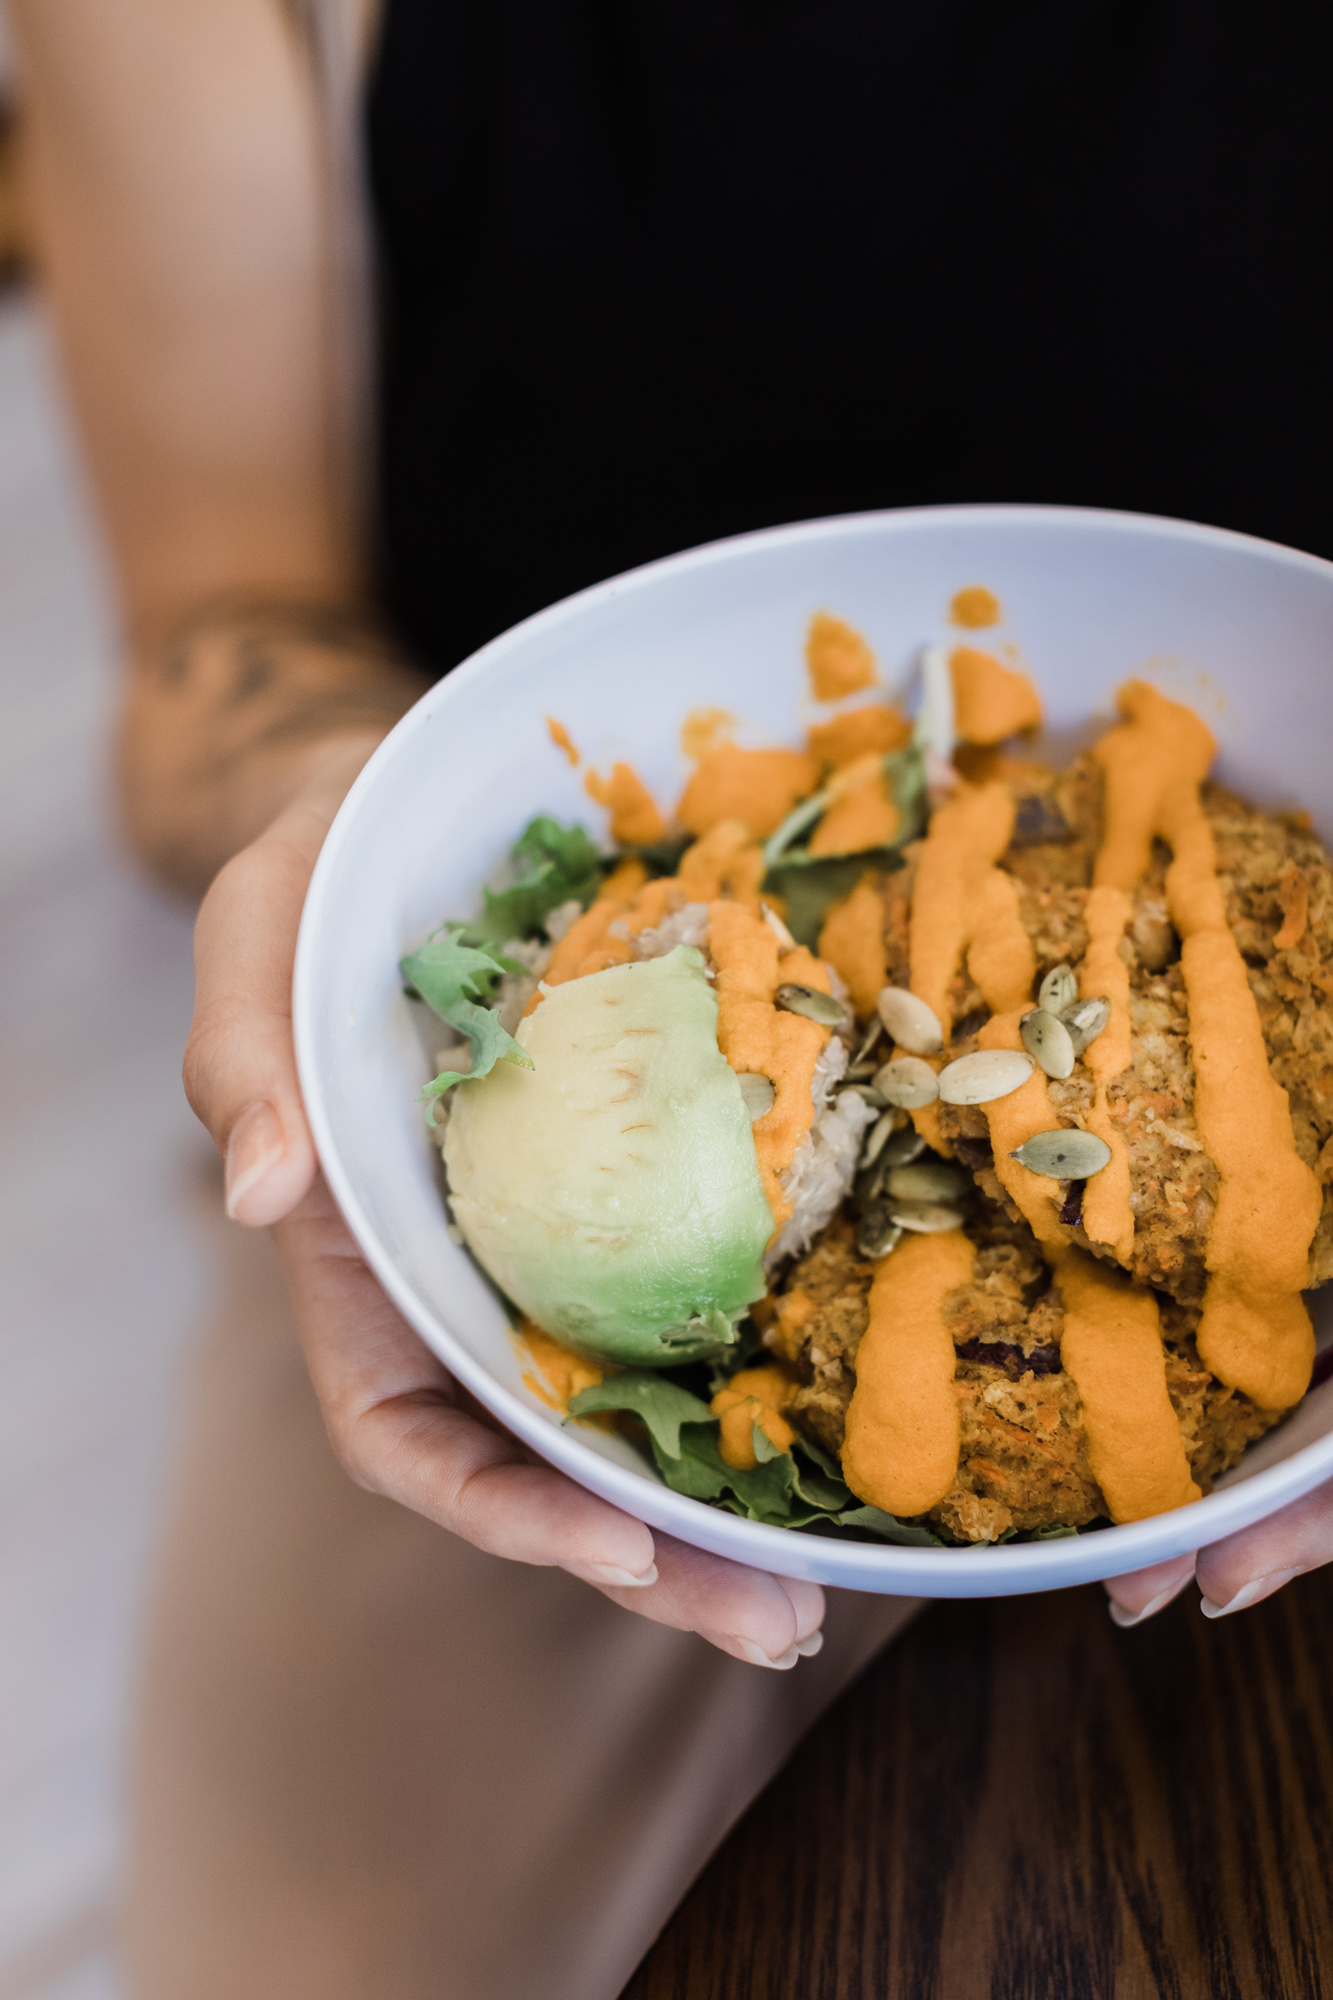 Vegan Buddha Bowl at That's A Wrap Cafe, Kihei Maui